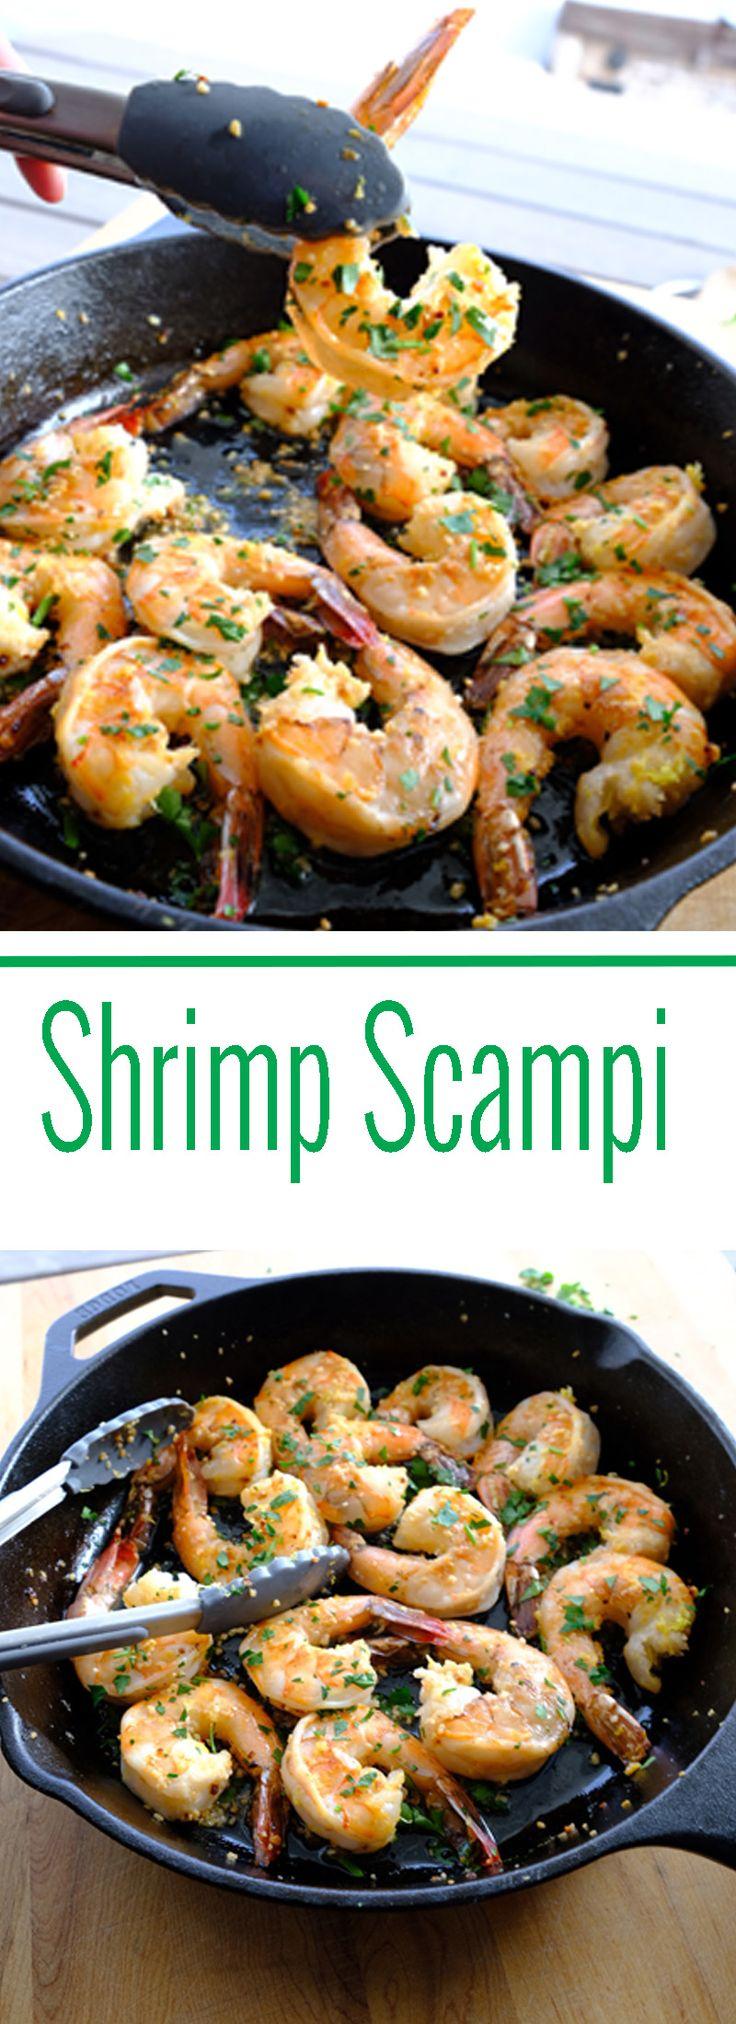 Lemon Shrimp Scampi